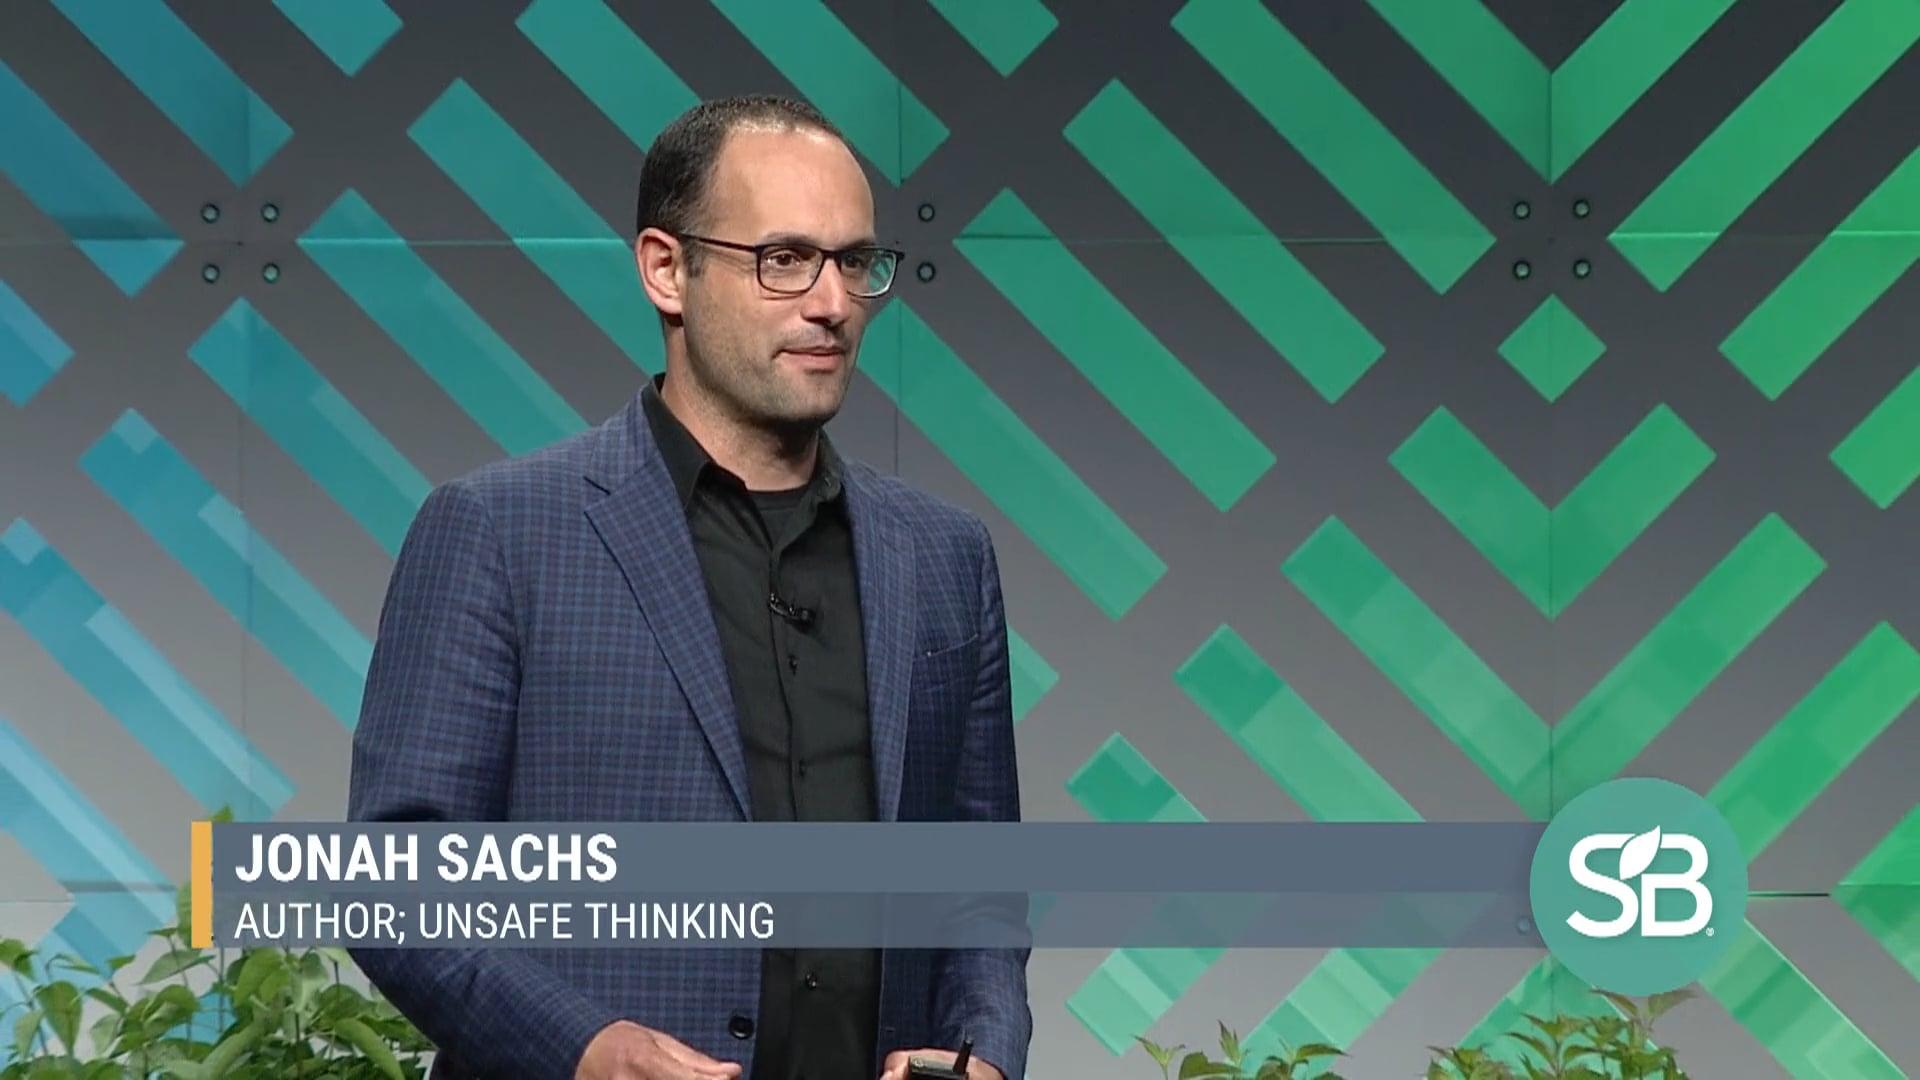 SB'19 Detroit Keynote / Jonah Sachs - Author, Unsafe Thinking